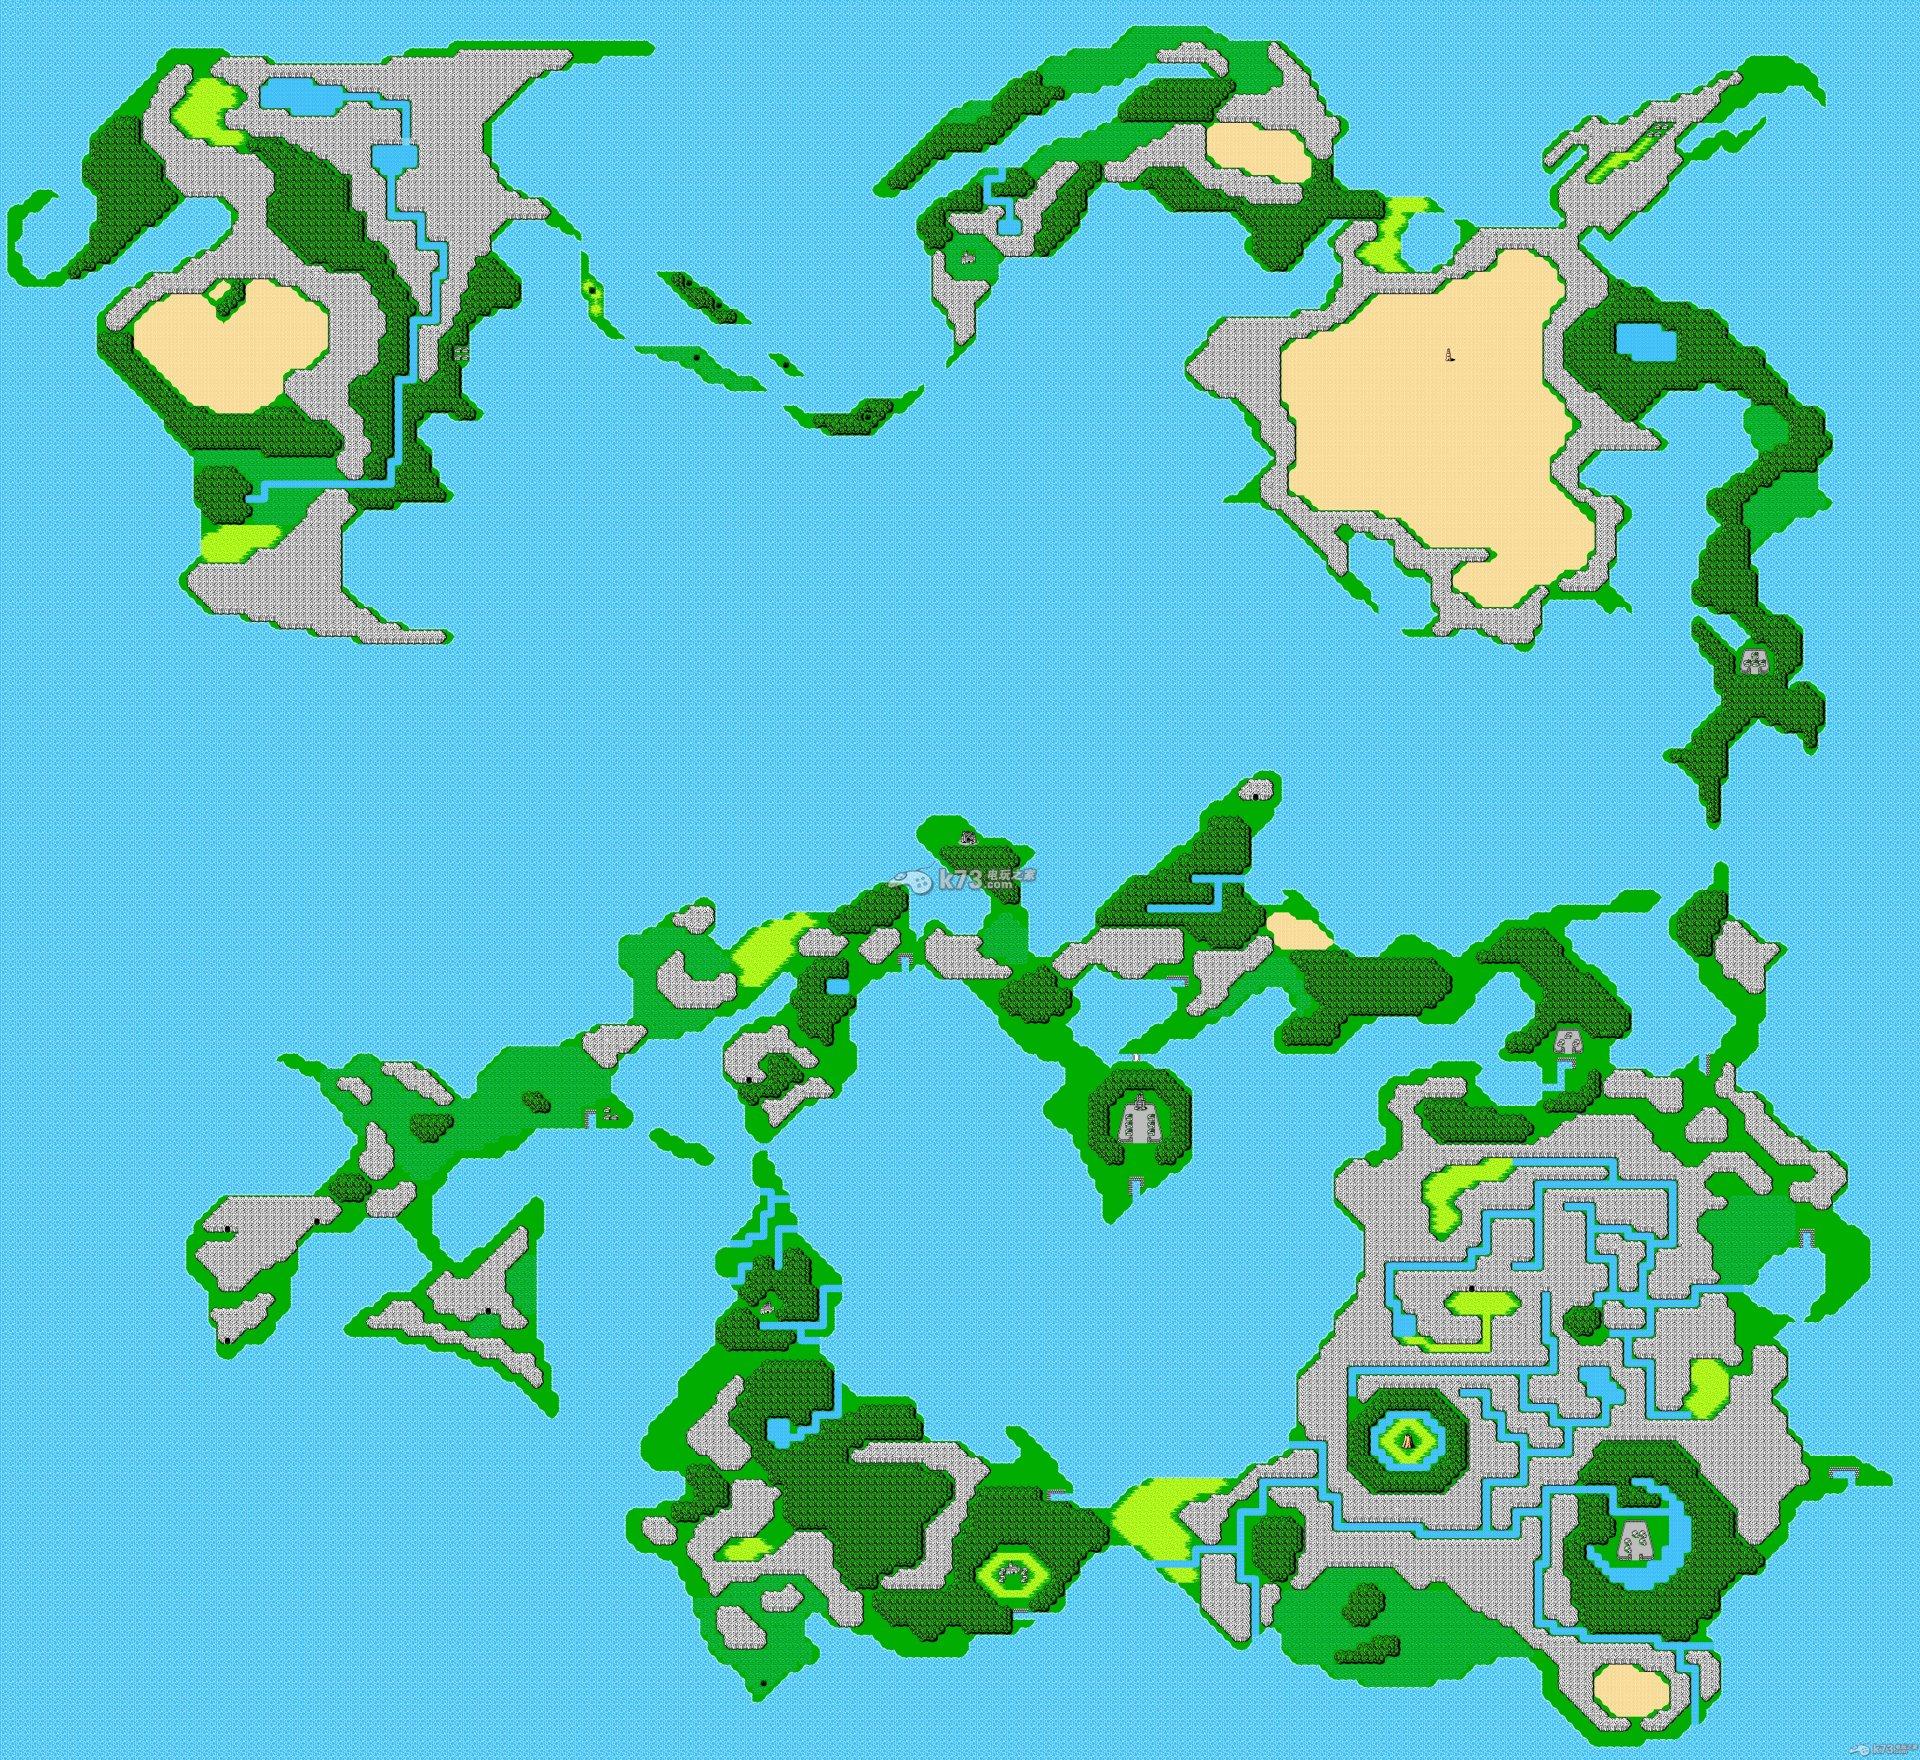 fc最终幻想1世界地图1:1